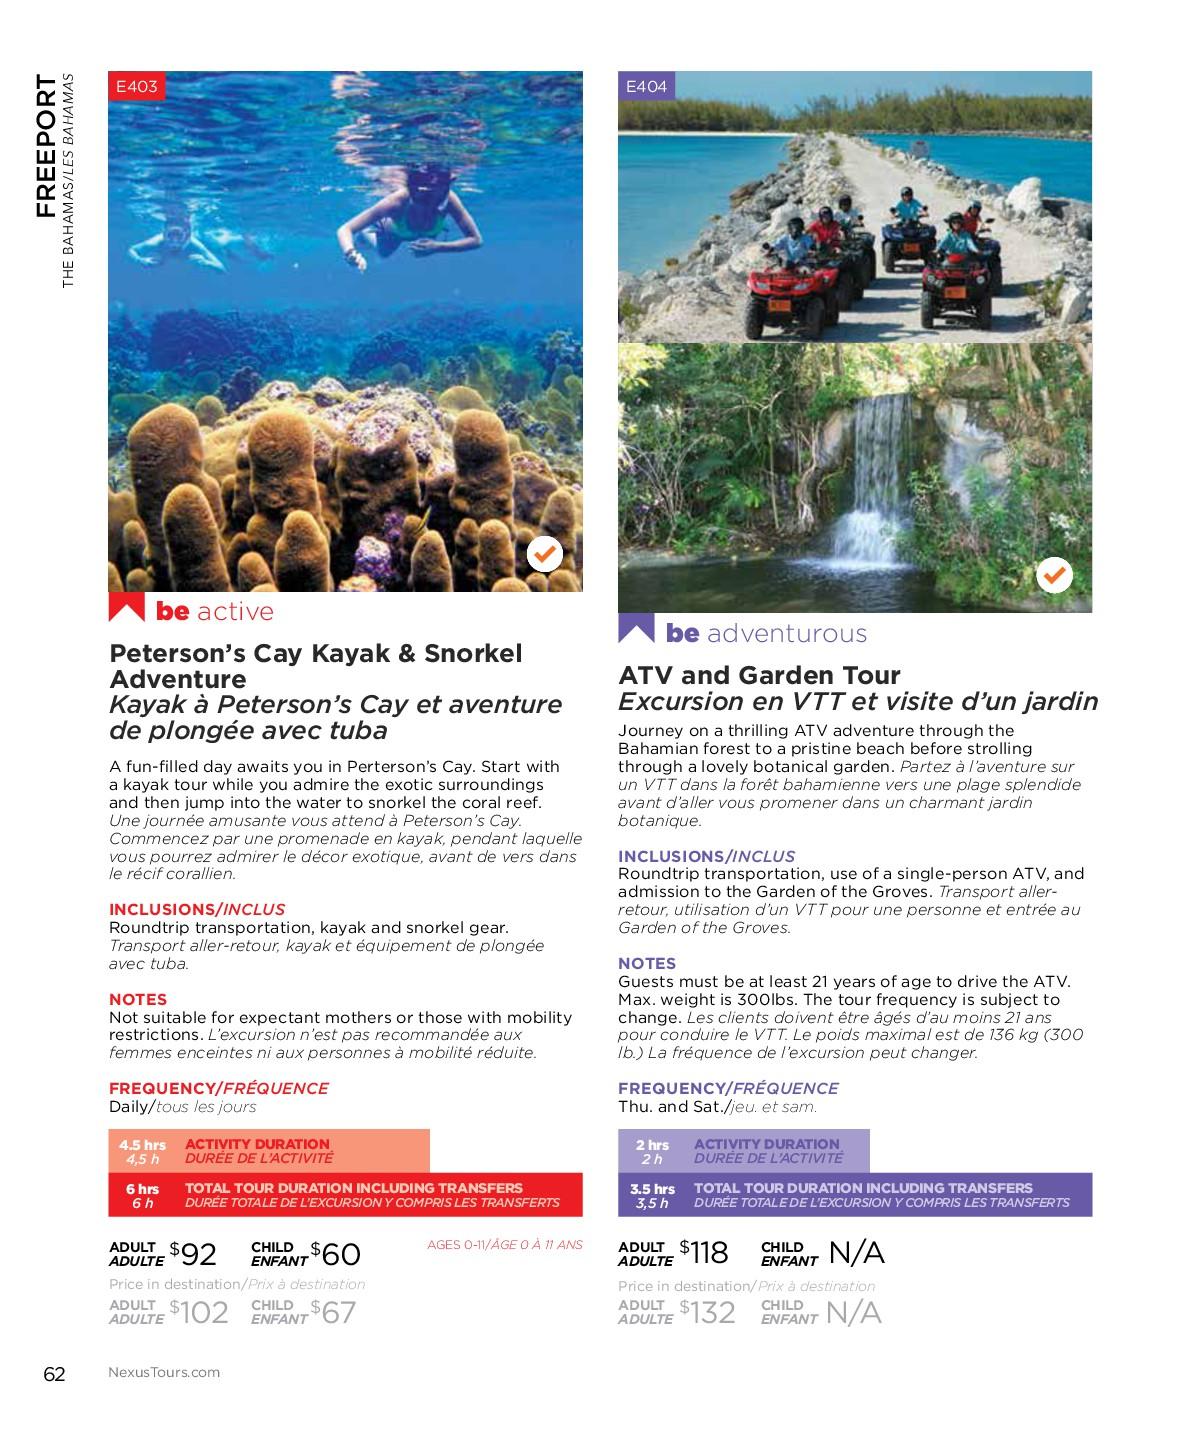 Jardin Botanique Luxe Index Of Flipbook Inflight8 Inc Pages